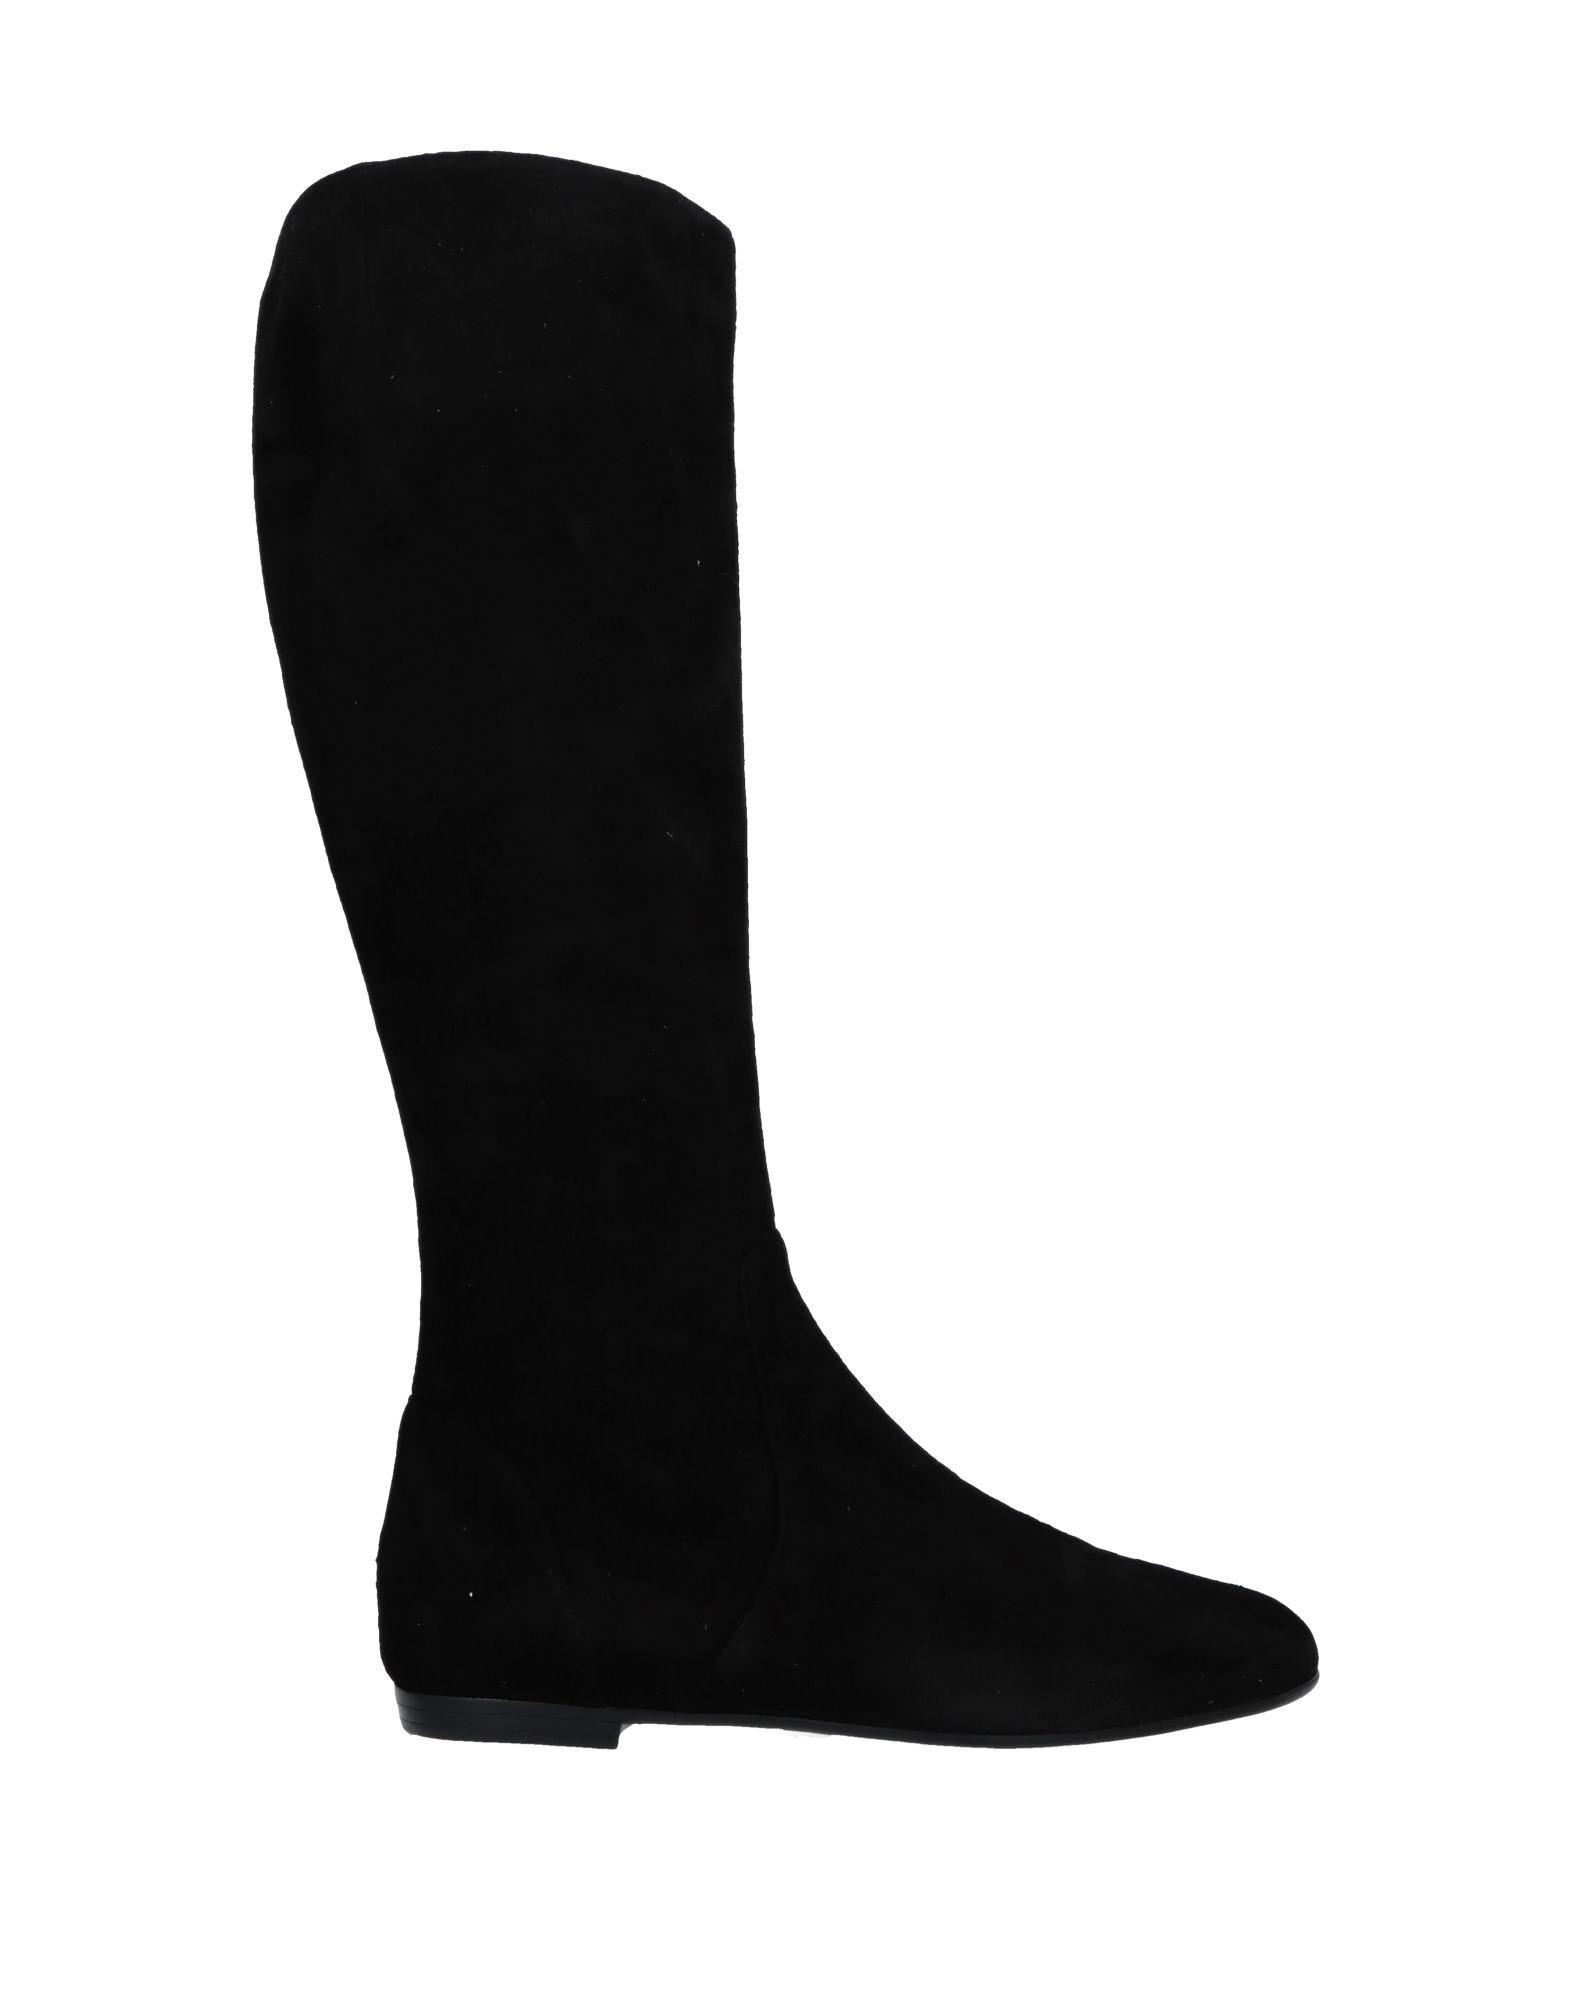 Giuseppe Zanotti Black Leather Knee High Boots